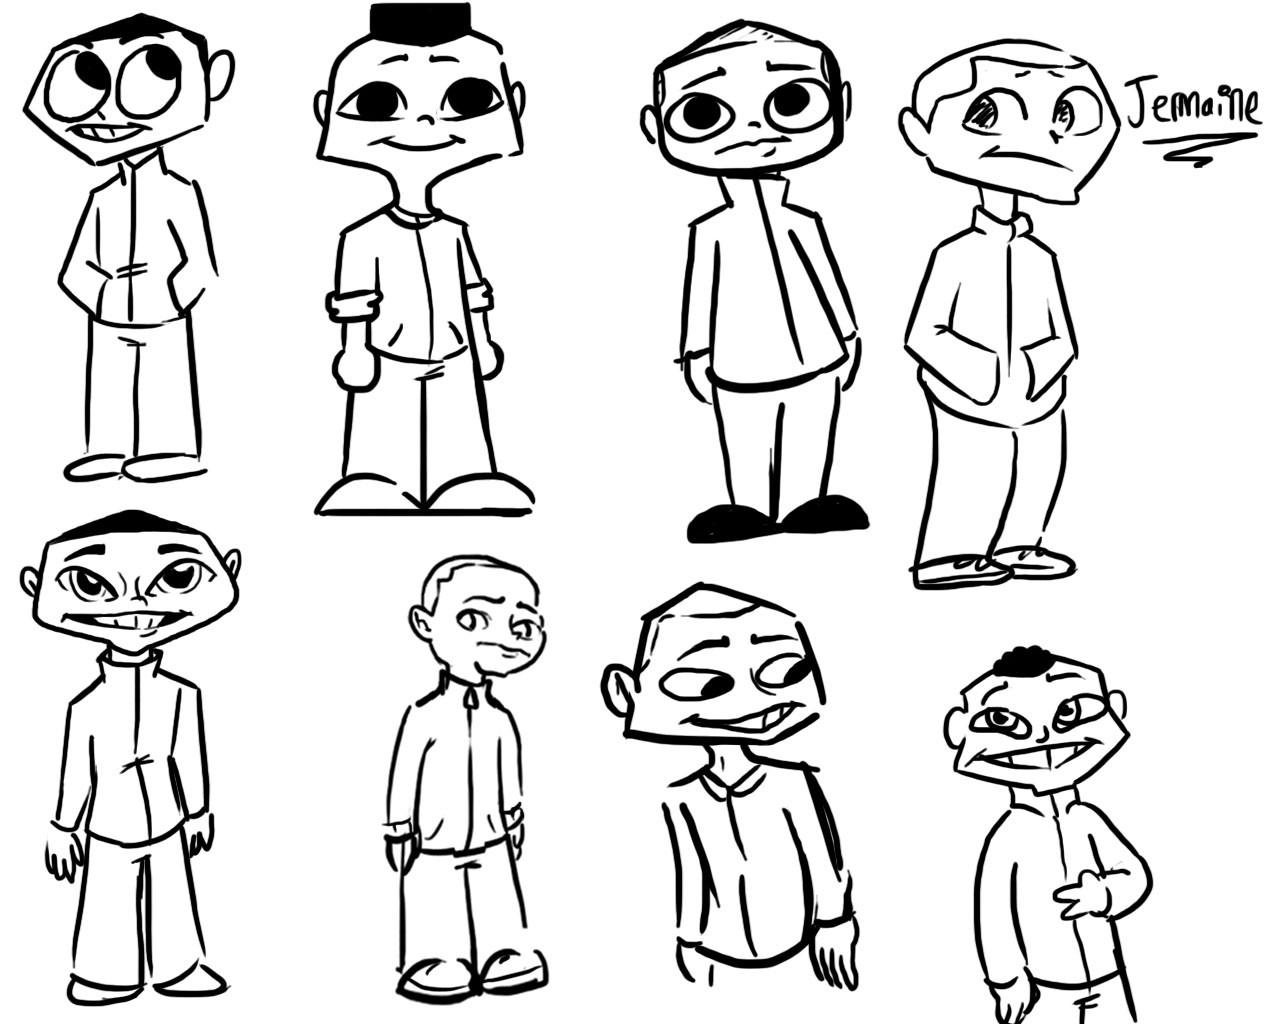 Jermaine rough designs.jpg